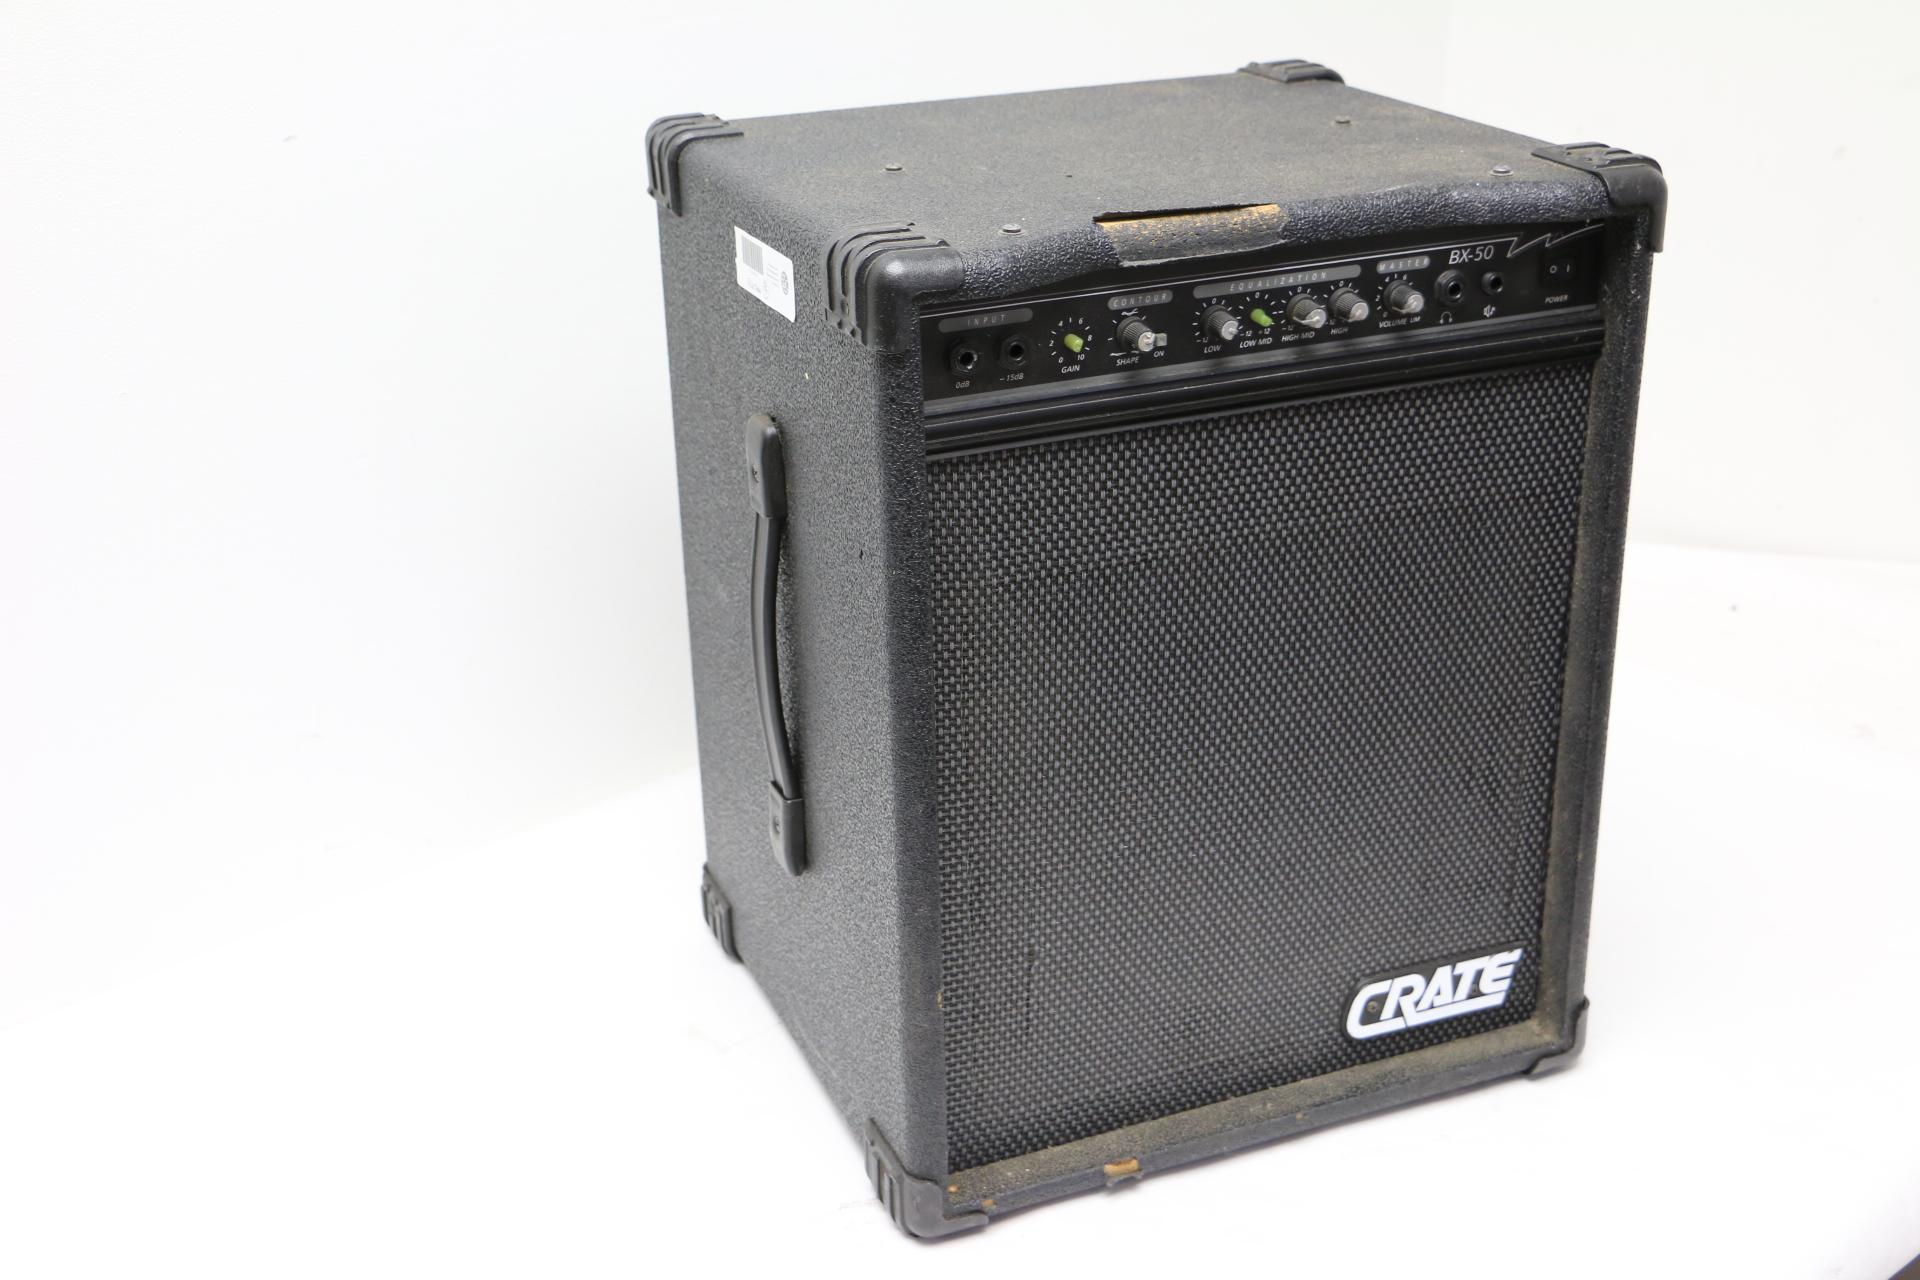 crate bx50 bass combo amplifier 120v 60hz bx50 amp bx 50 eq contour gain 8ohms ebay. Black Bedroom Furniture Sets. Home Design Ideas